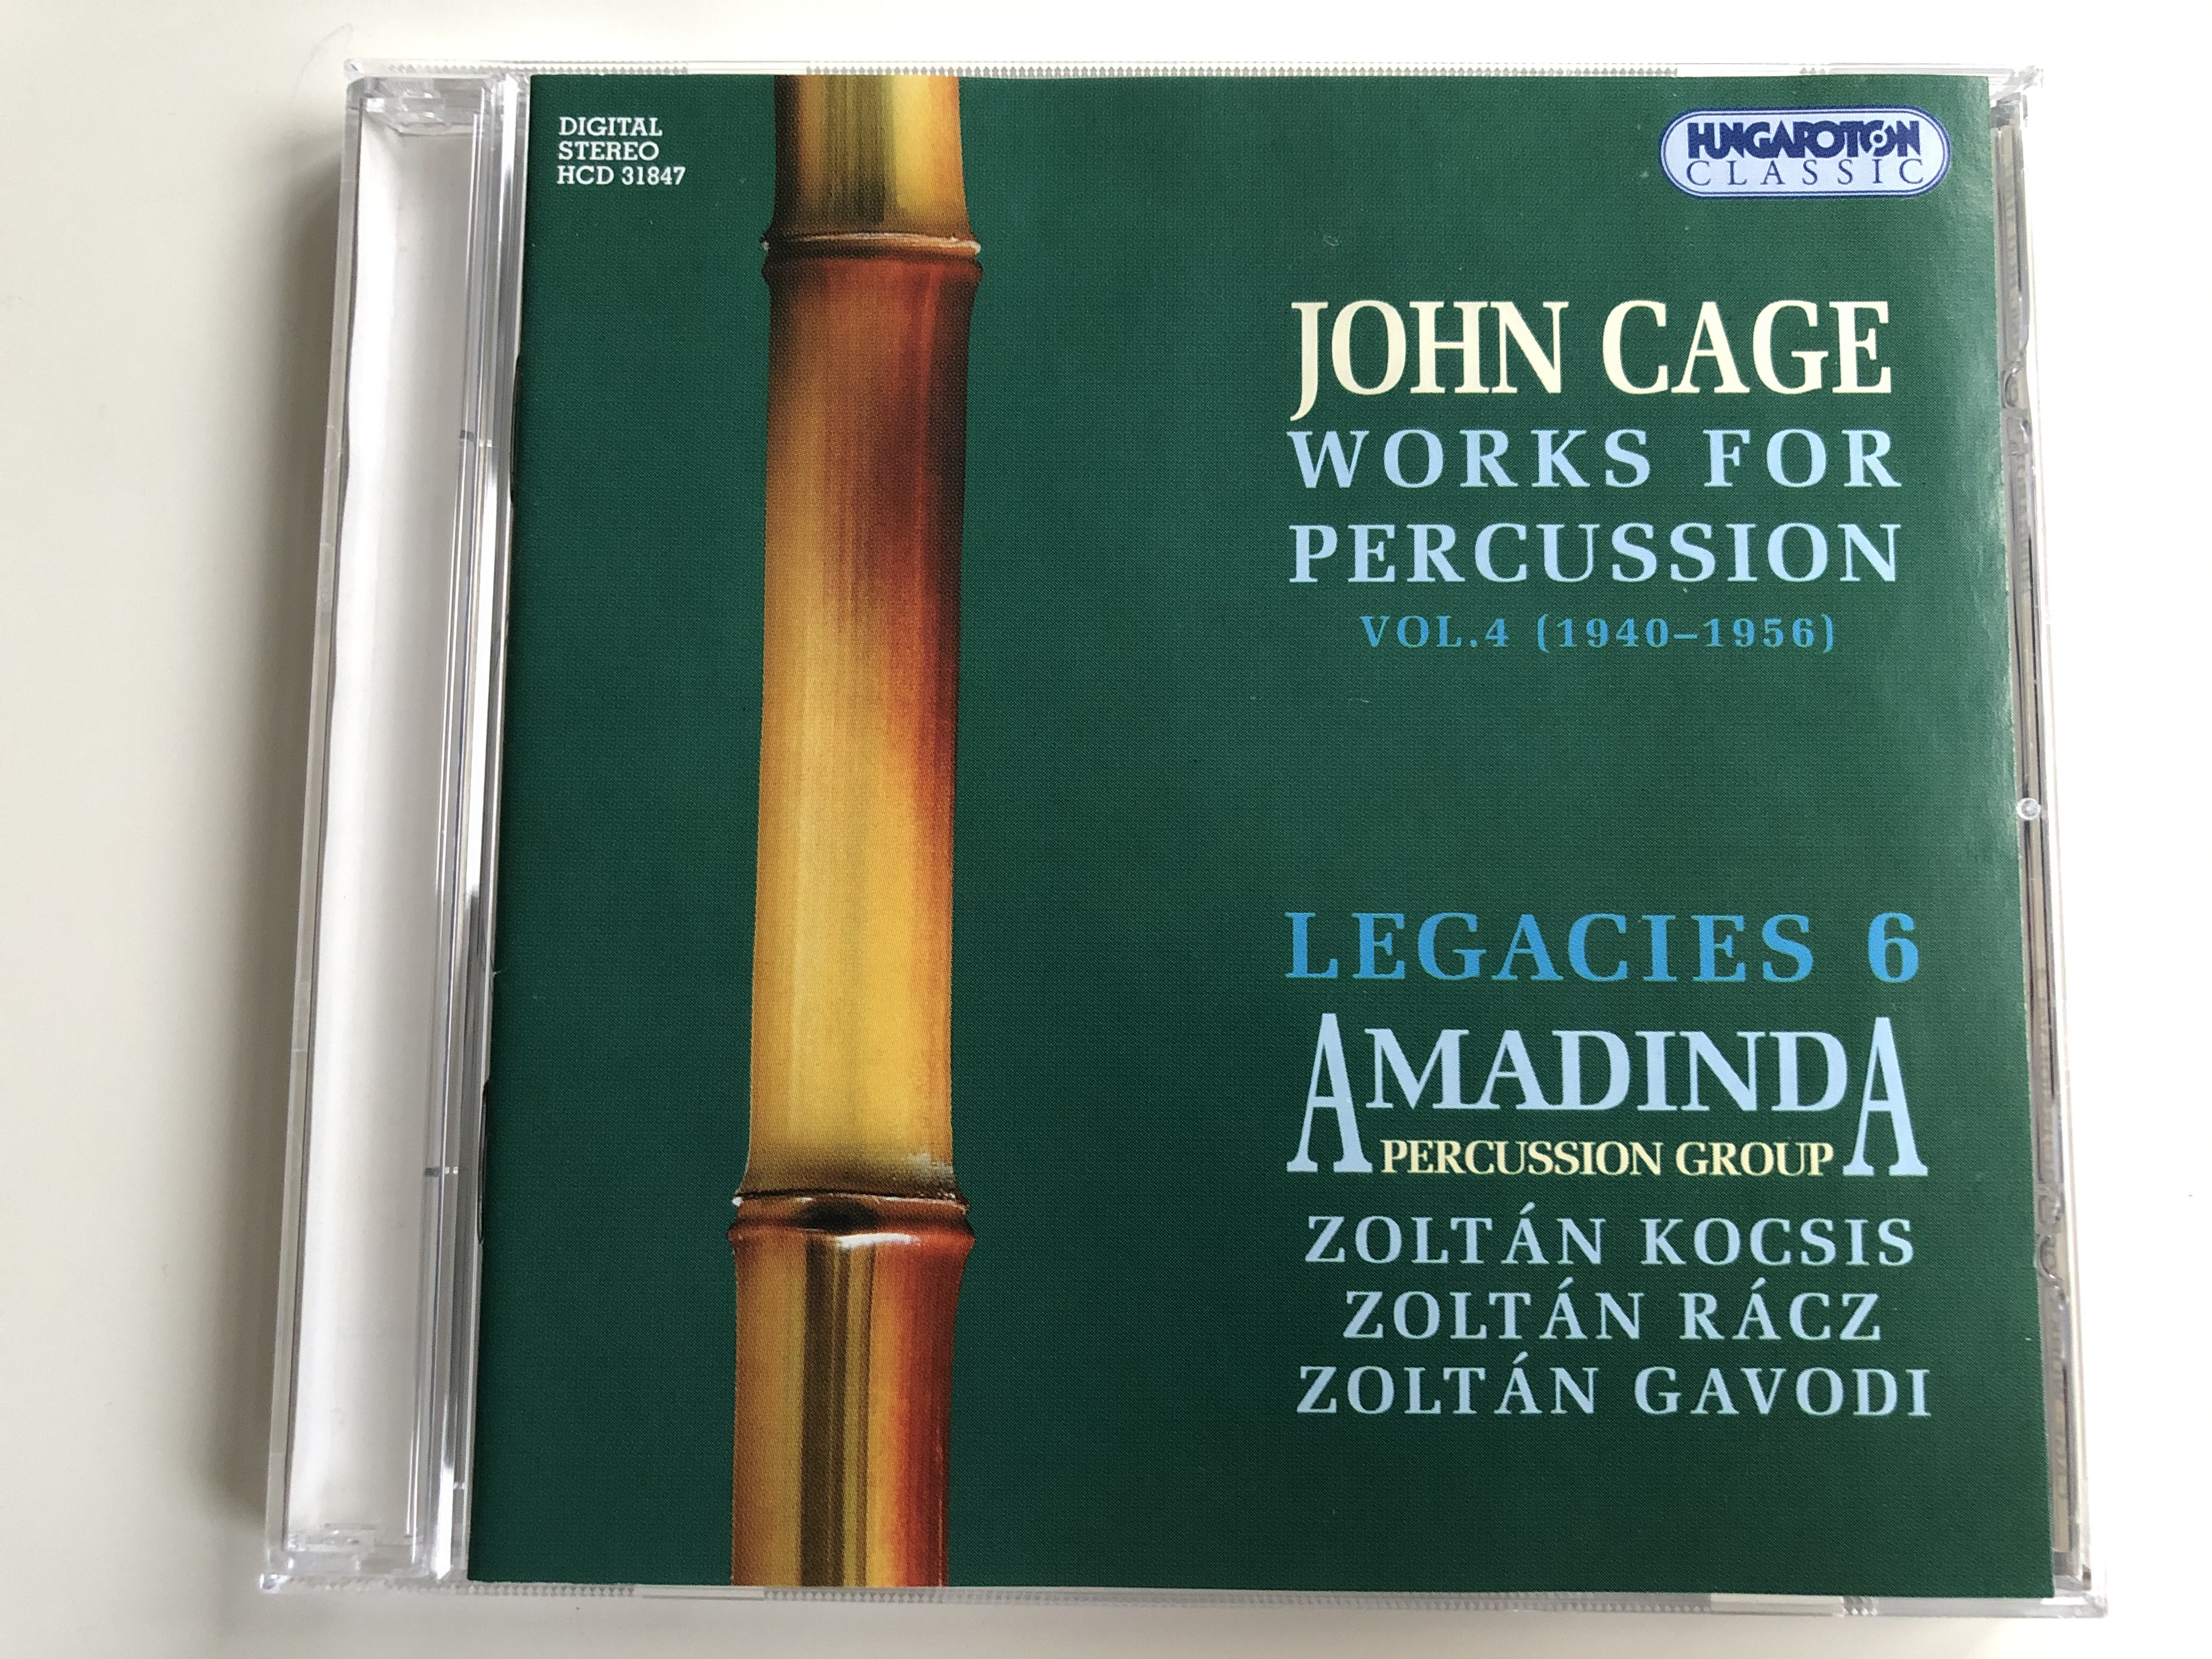 john-cage-works-for-percussion-vol.4-1940-1956-legacies-6-amadinda-percussion-group-zolt-n-kocsis-zolt-n-r-cz-zolt-n-gavodi-hungaroton-classic-audio-cd-2005-stereo-hcd-31847-1-.jpg